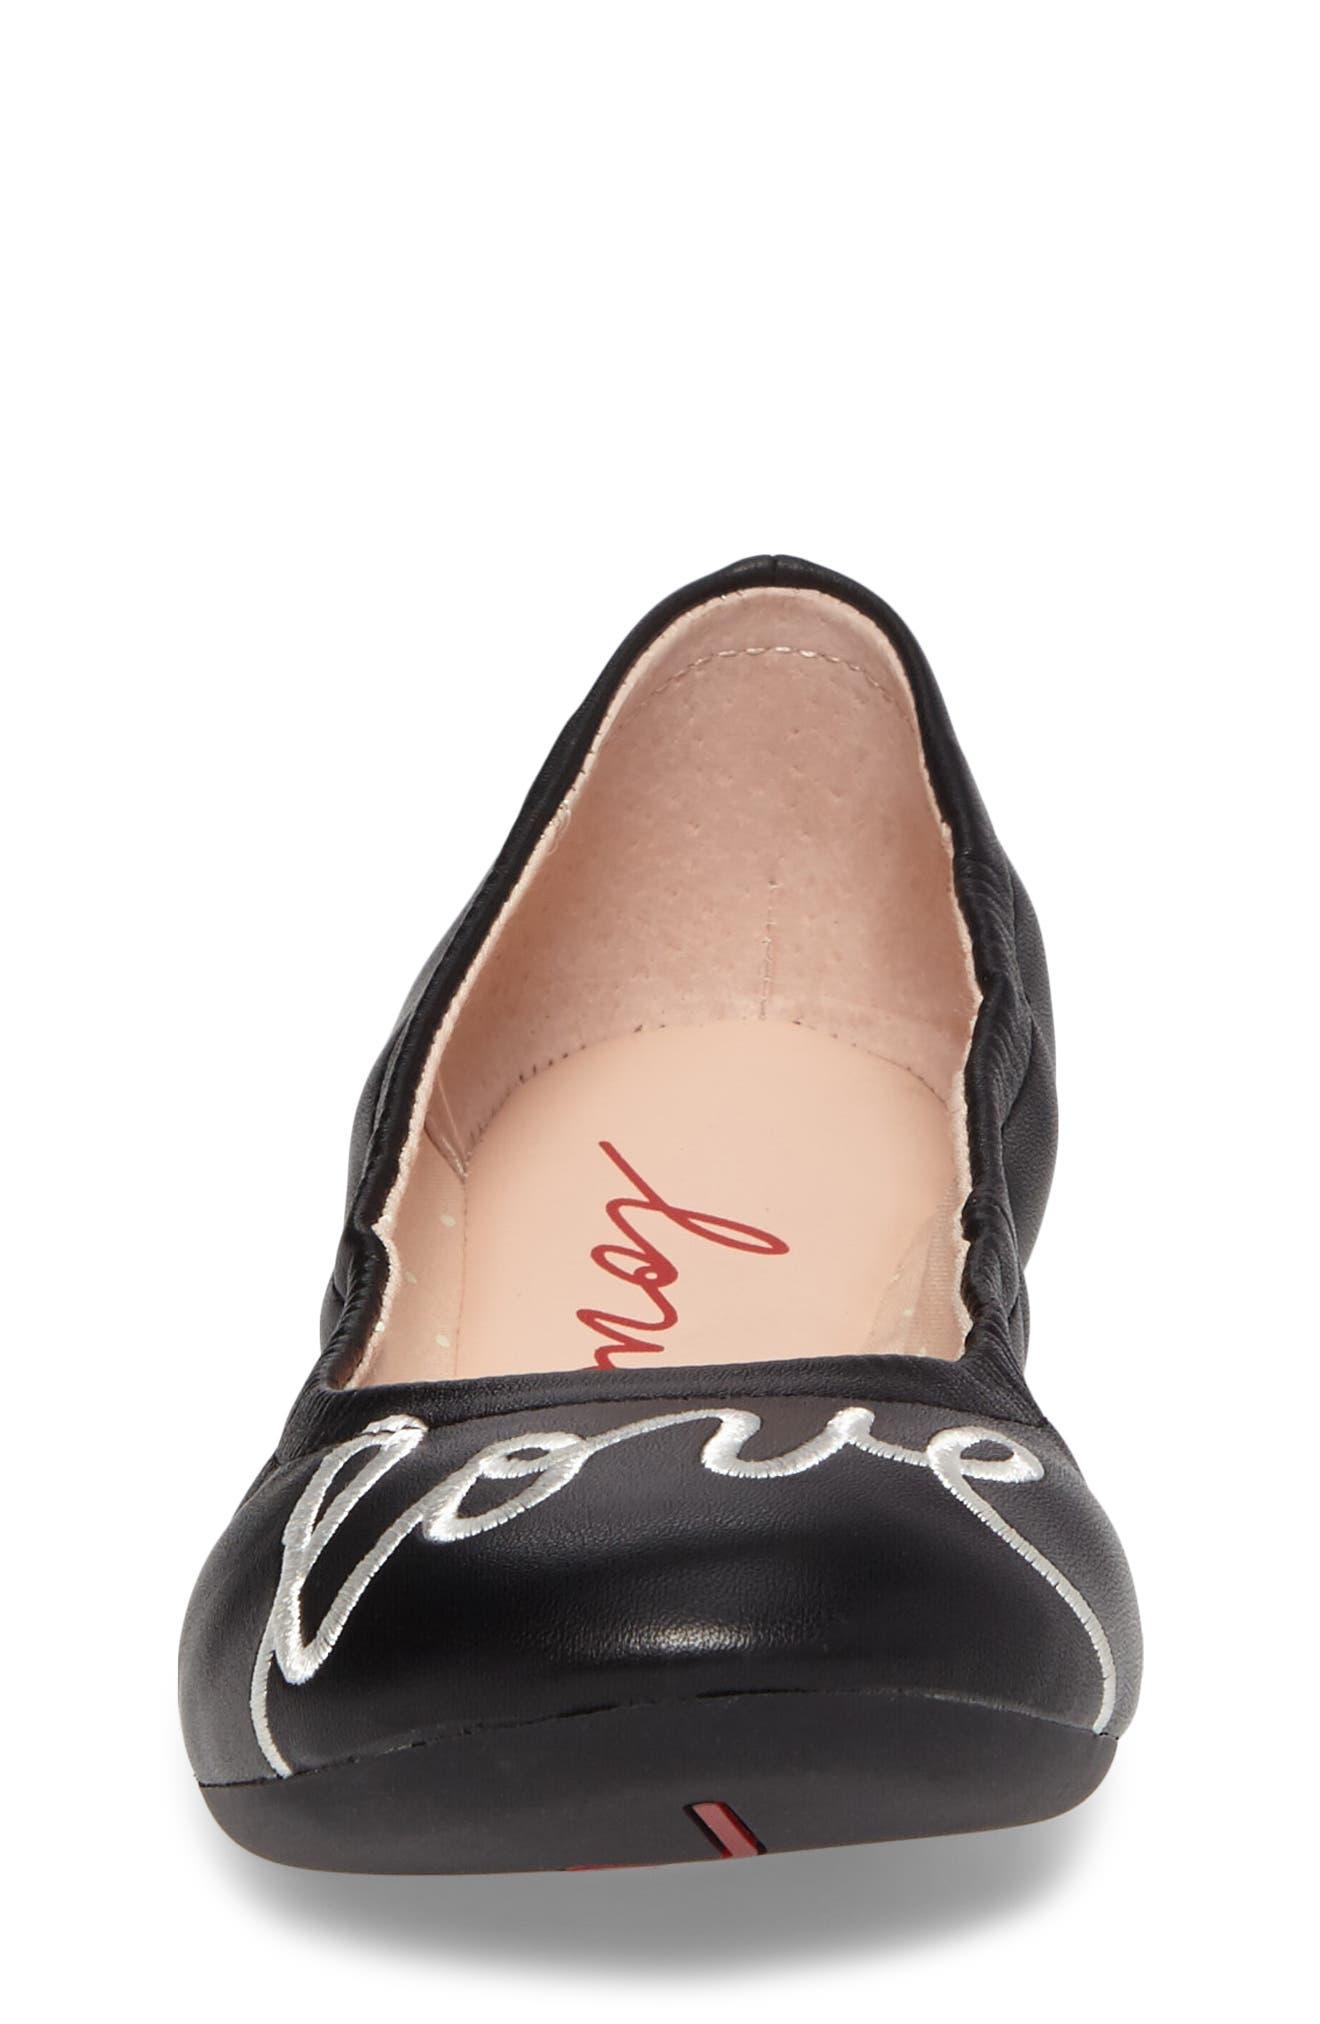 ED ELLEN DEGENERES, Langlee Embroidered Ballet Flat, Alternate thumbnail 4, color, BLACK